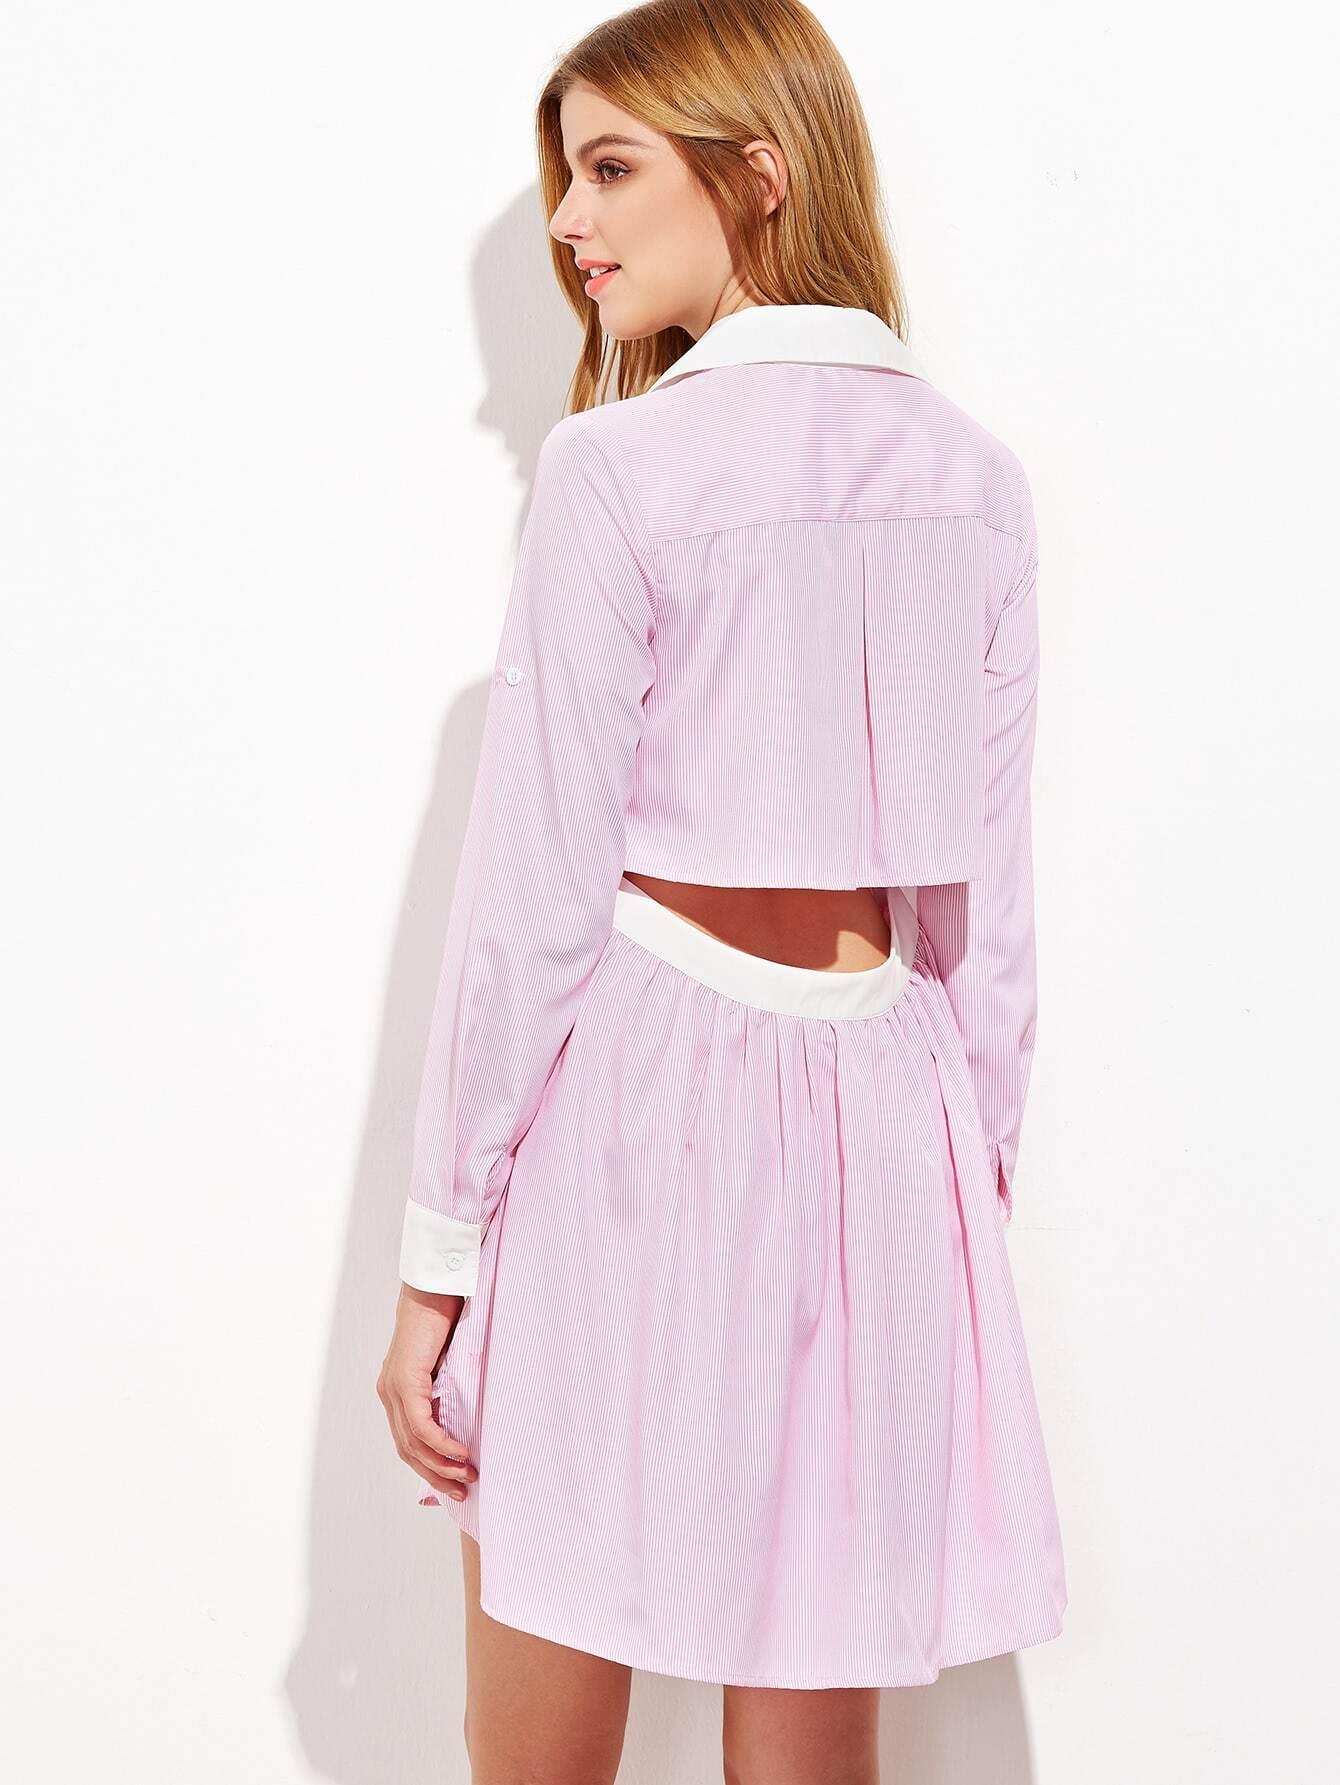 Pink Contrast Collar And Cuff Open Back Shirt Dress Shein